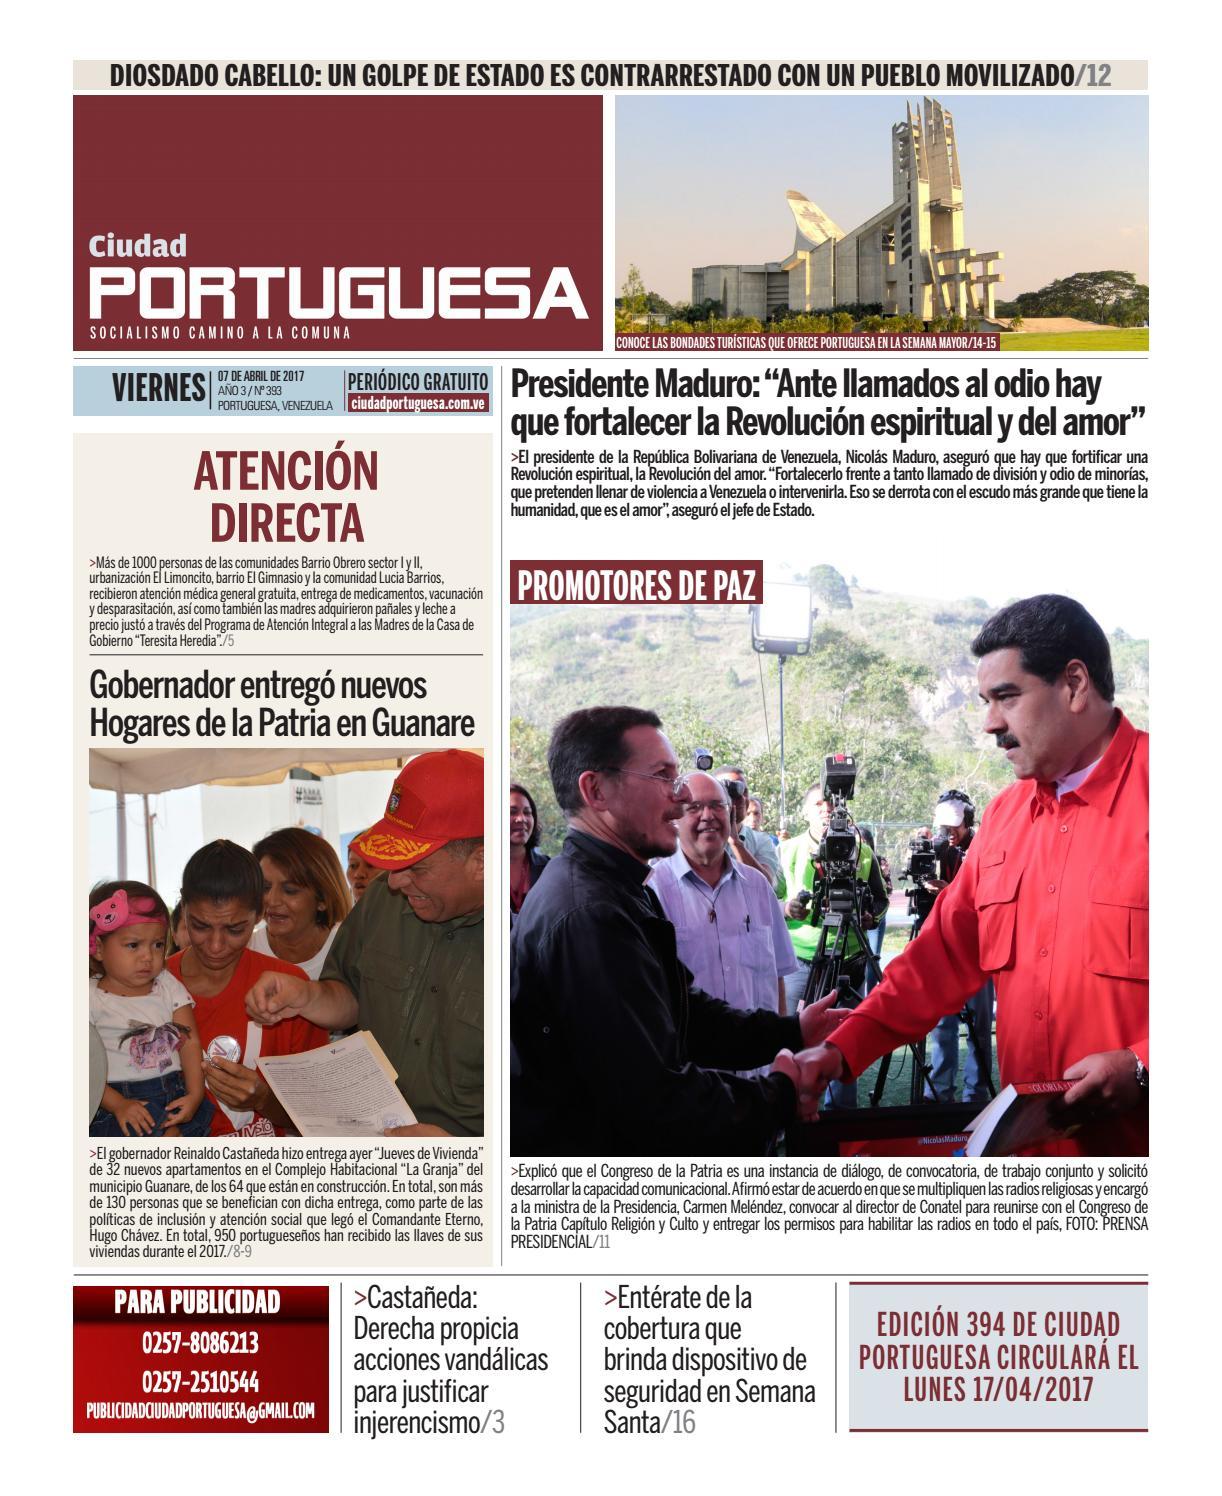 Se Procura Casal Em Ciudad Venezuela-55280